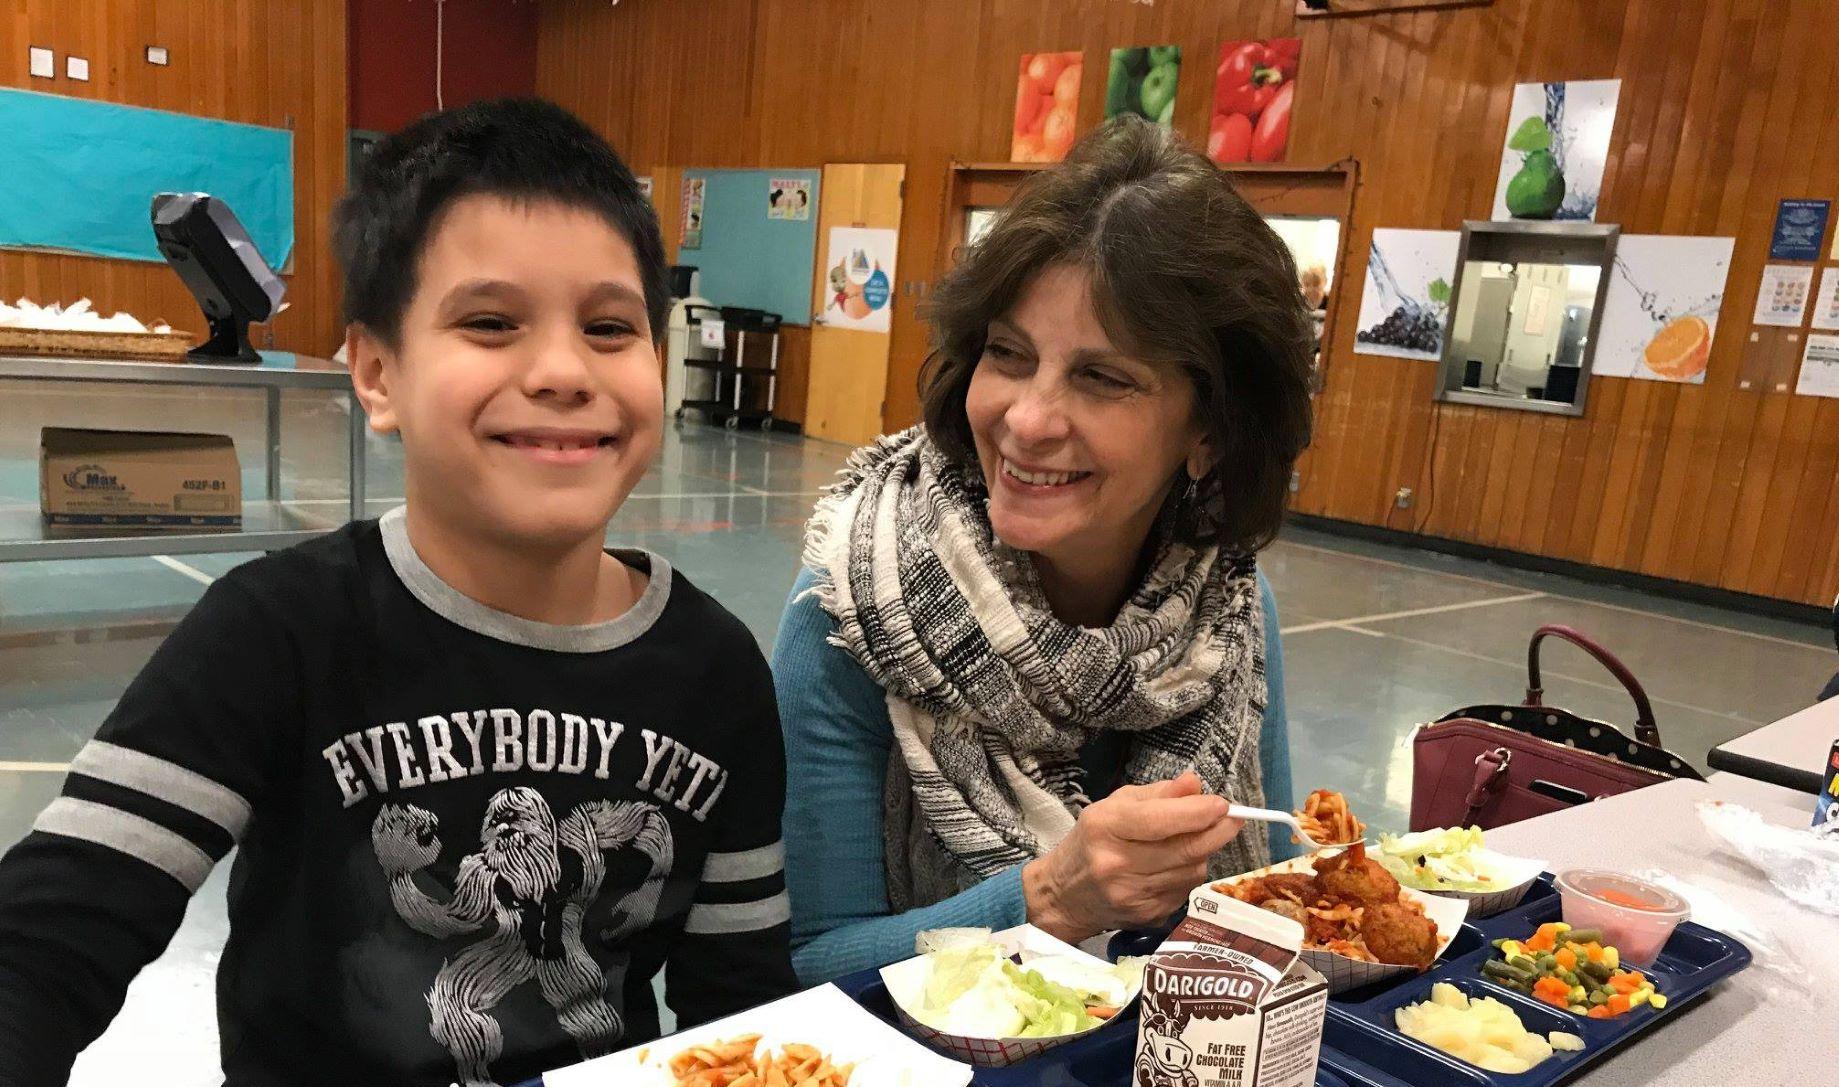 North Clackamas School District Lunch Buddies program